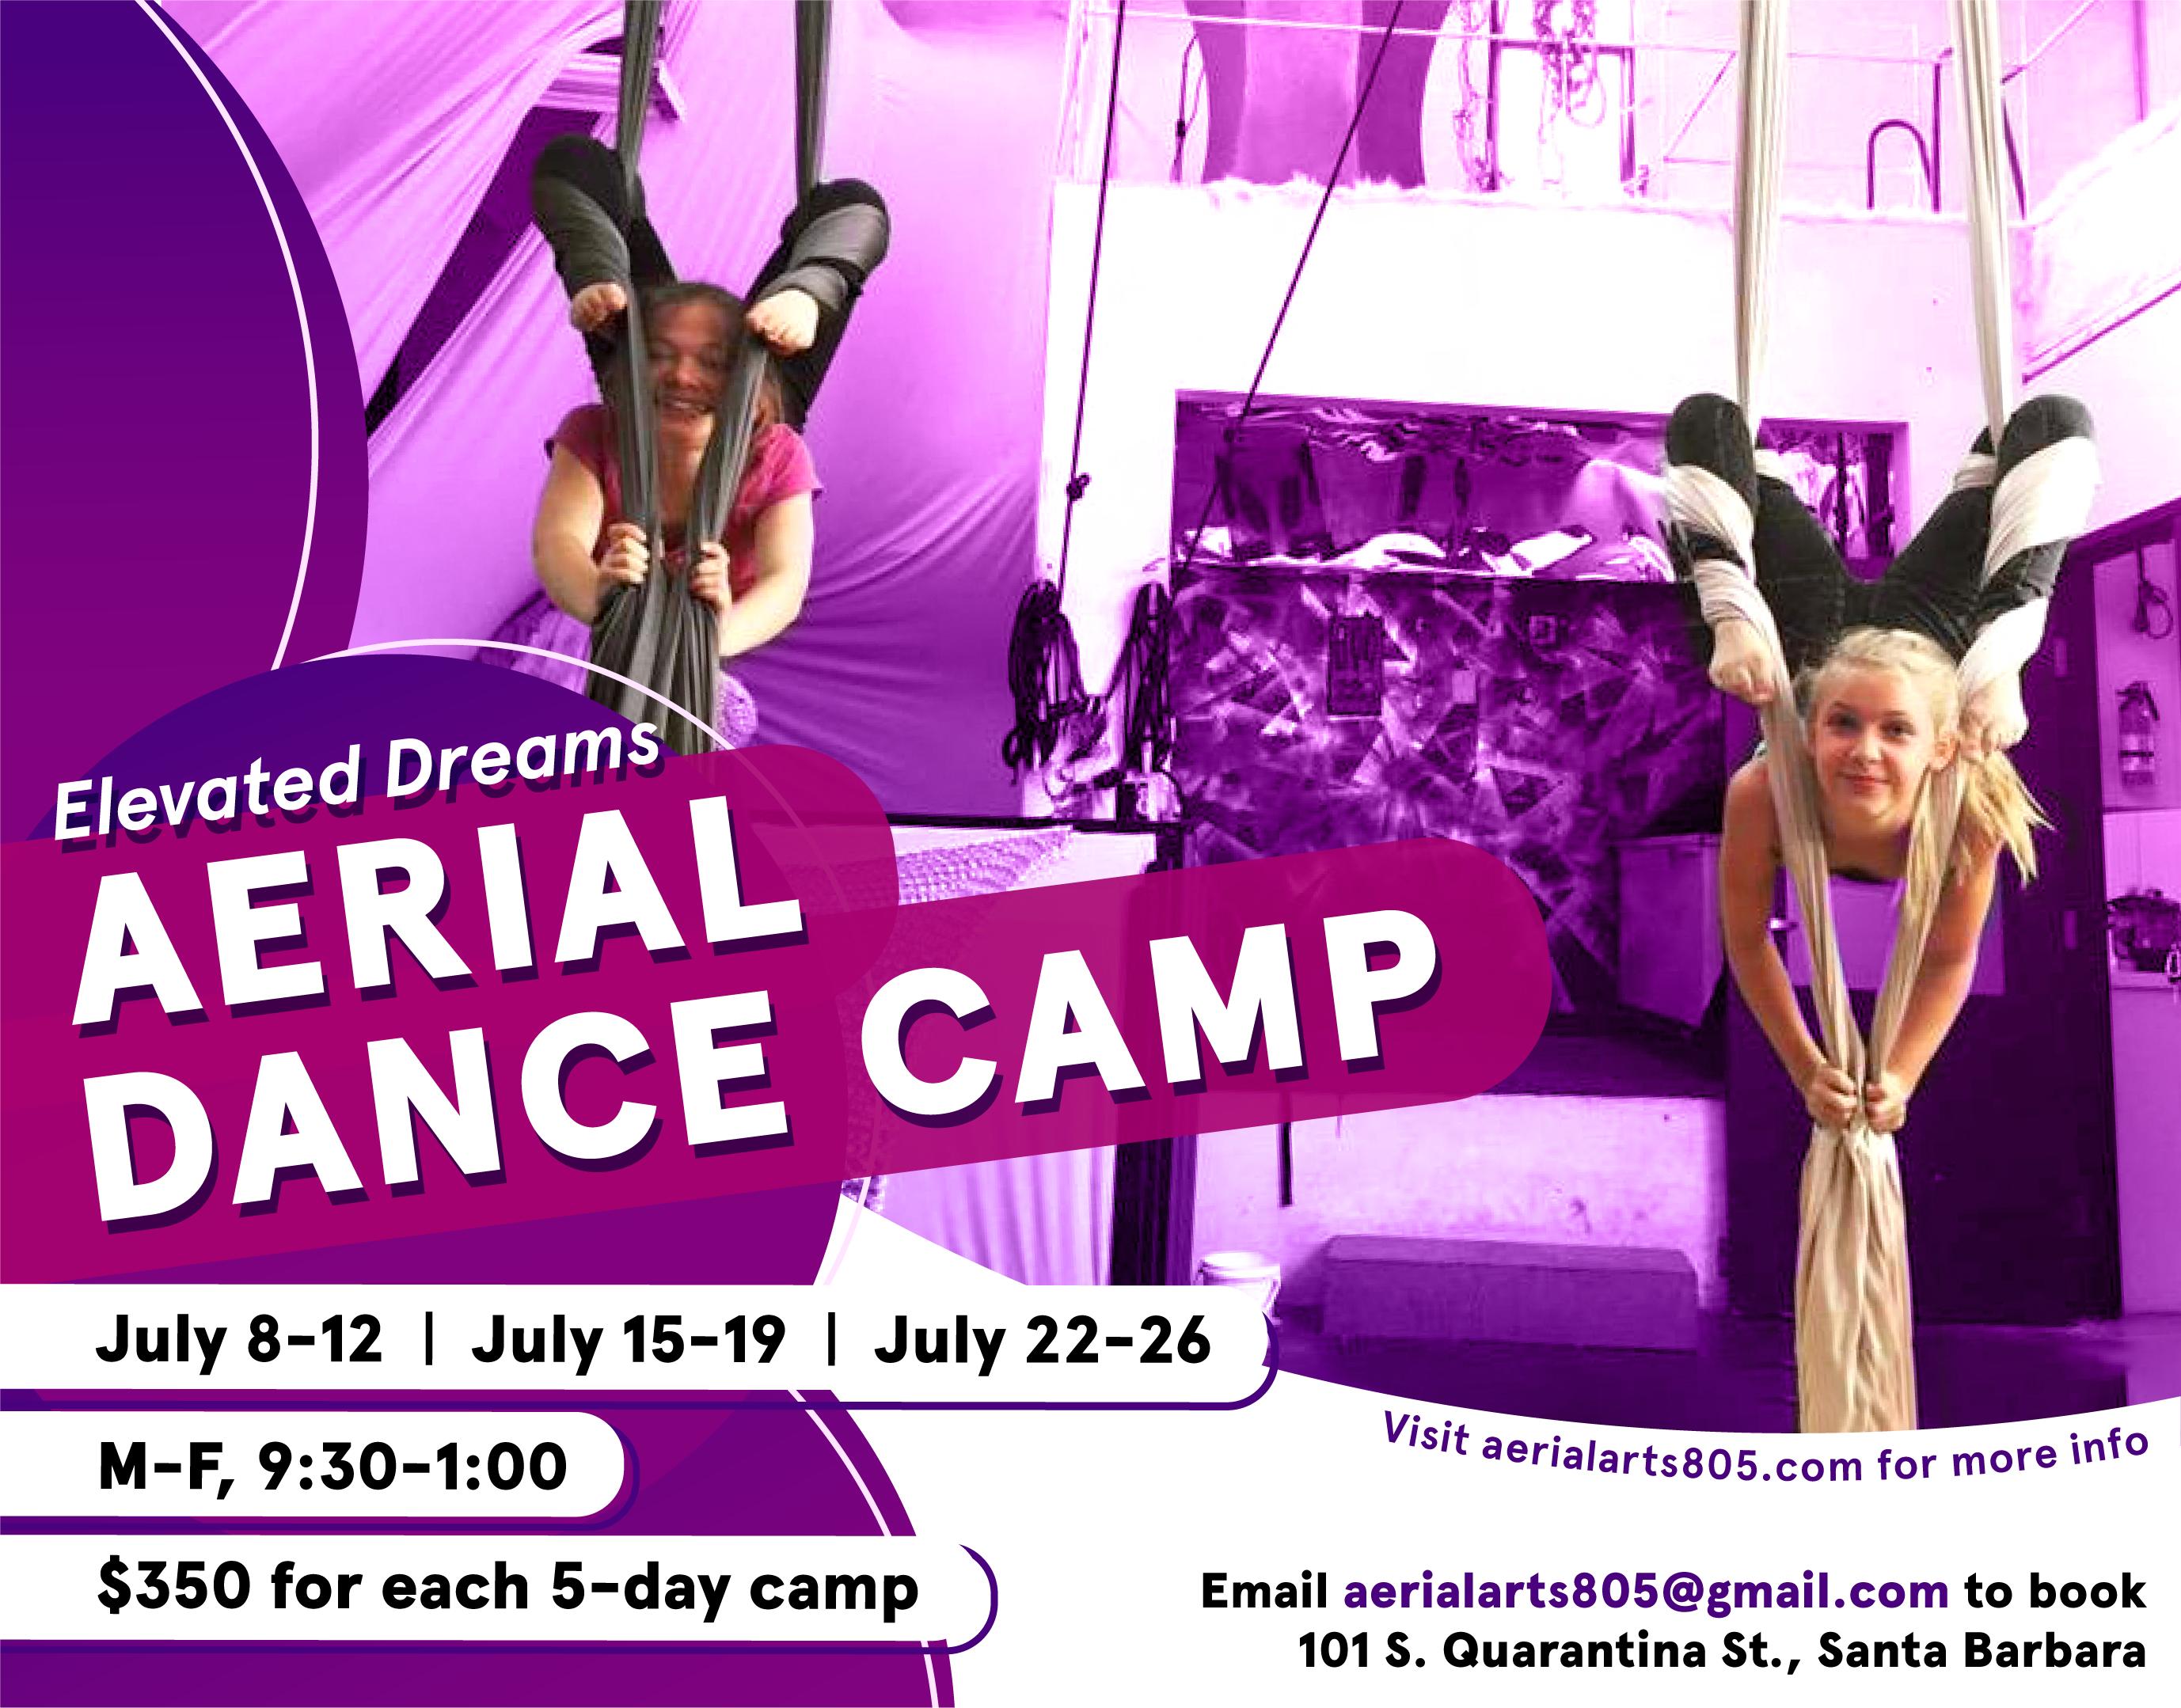 santa barbara youth aerial dance camp